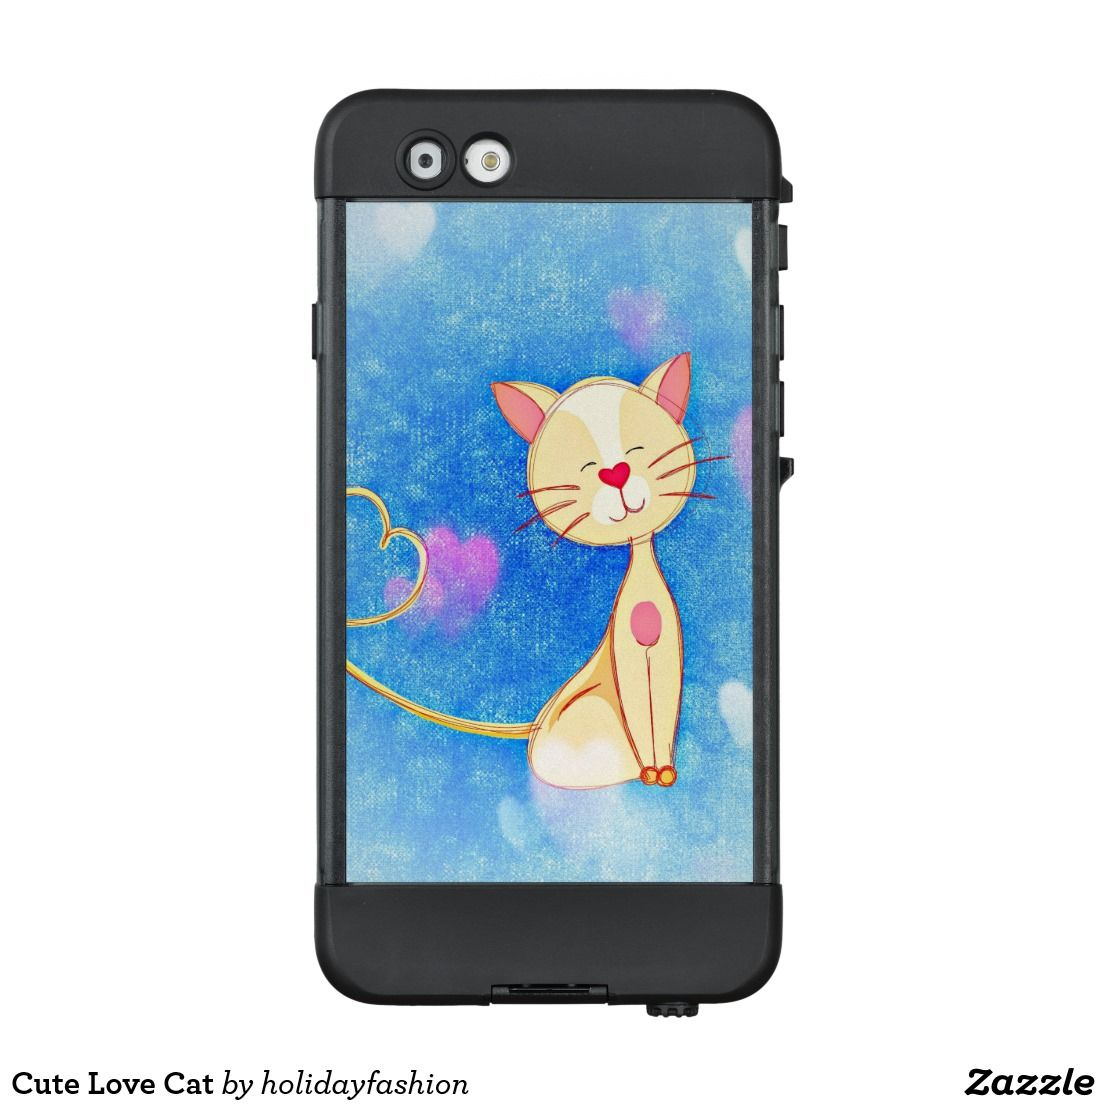 Cute love cat lifeproof iphone case